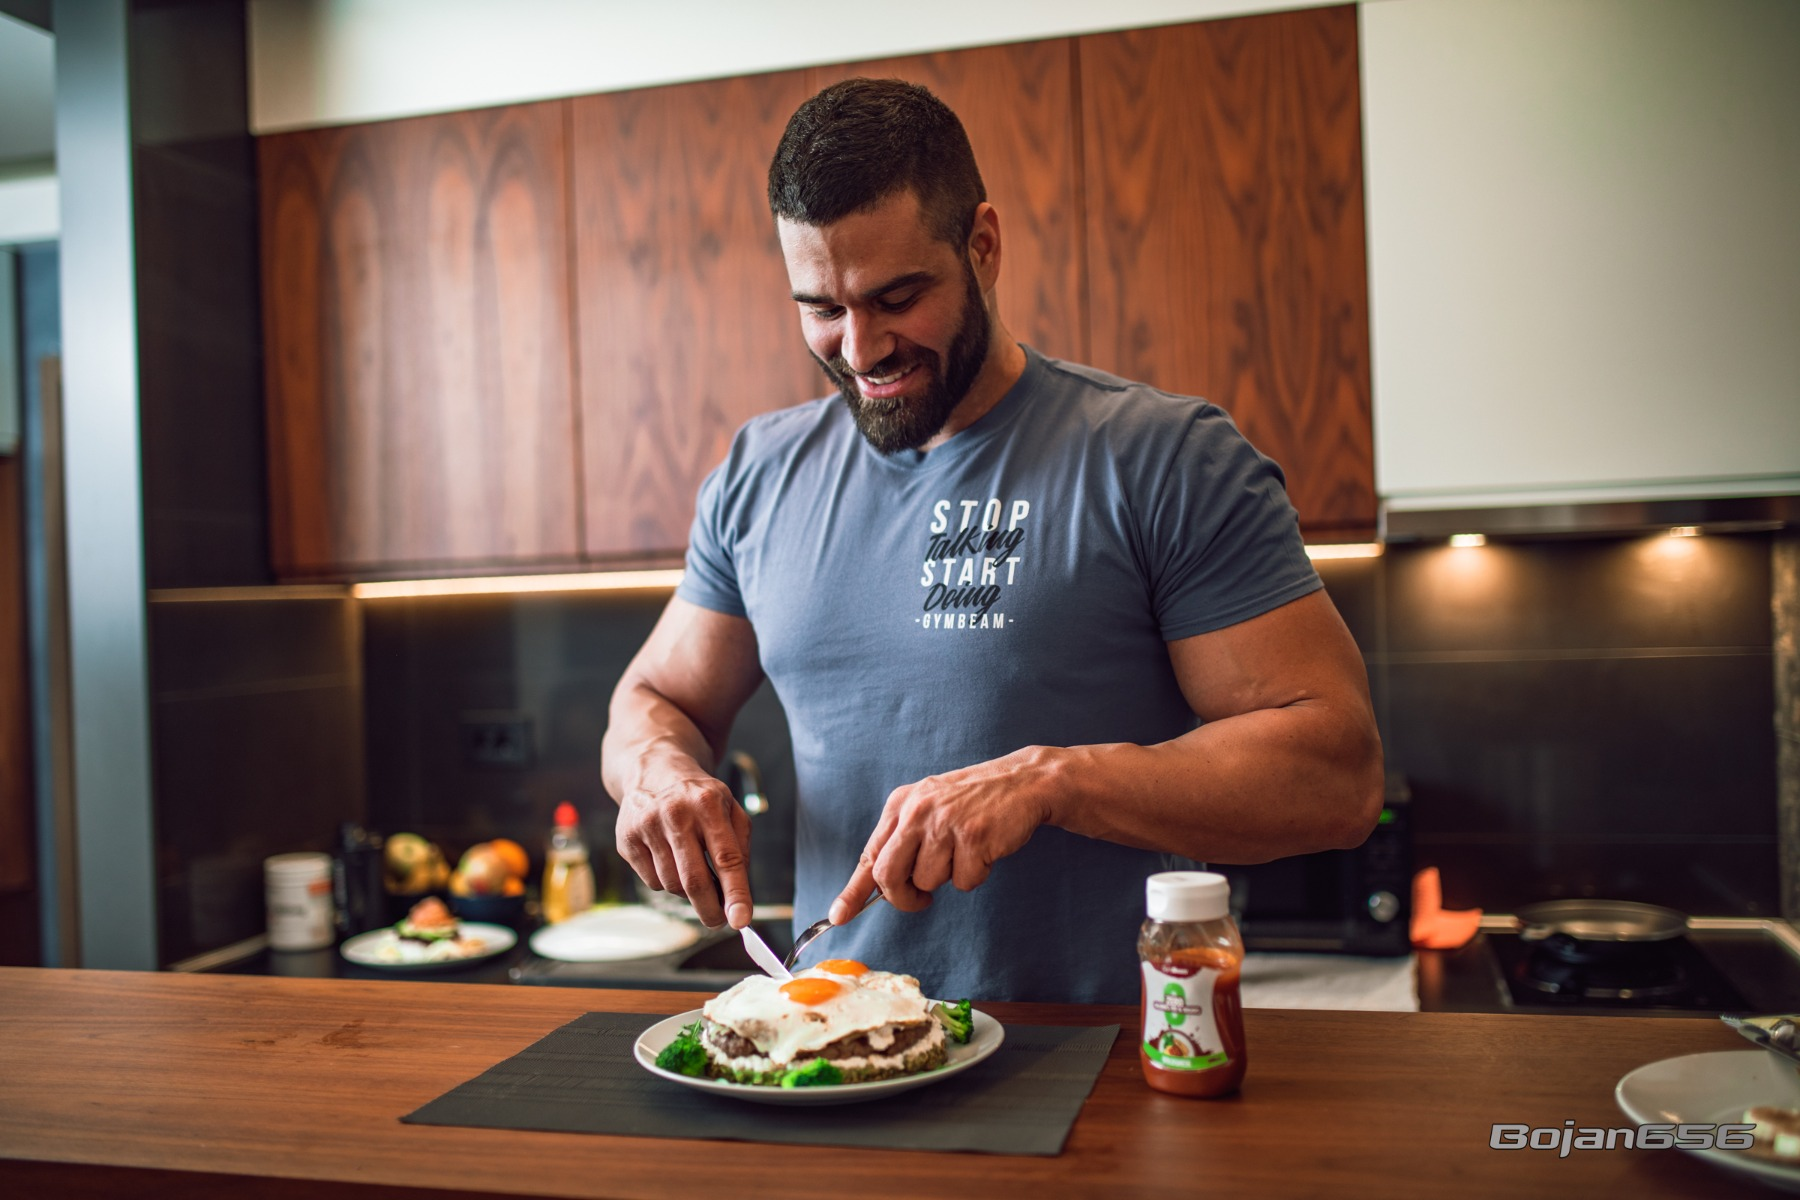 Читмил (cheat meal) – обман диеты и разгон метаболизма или самообман?